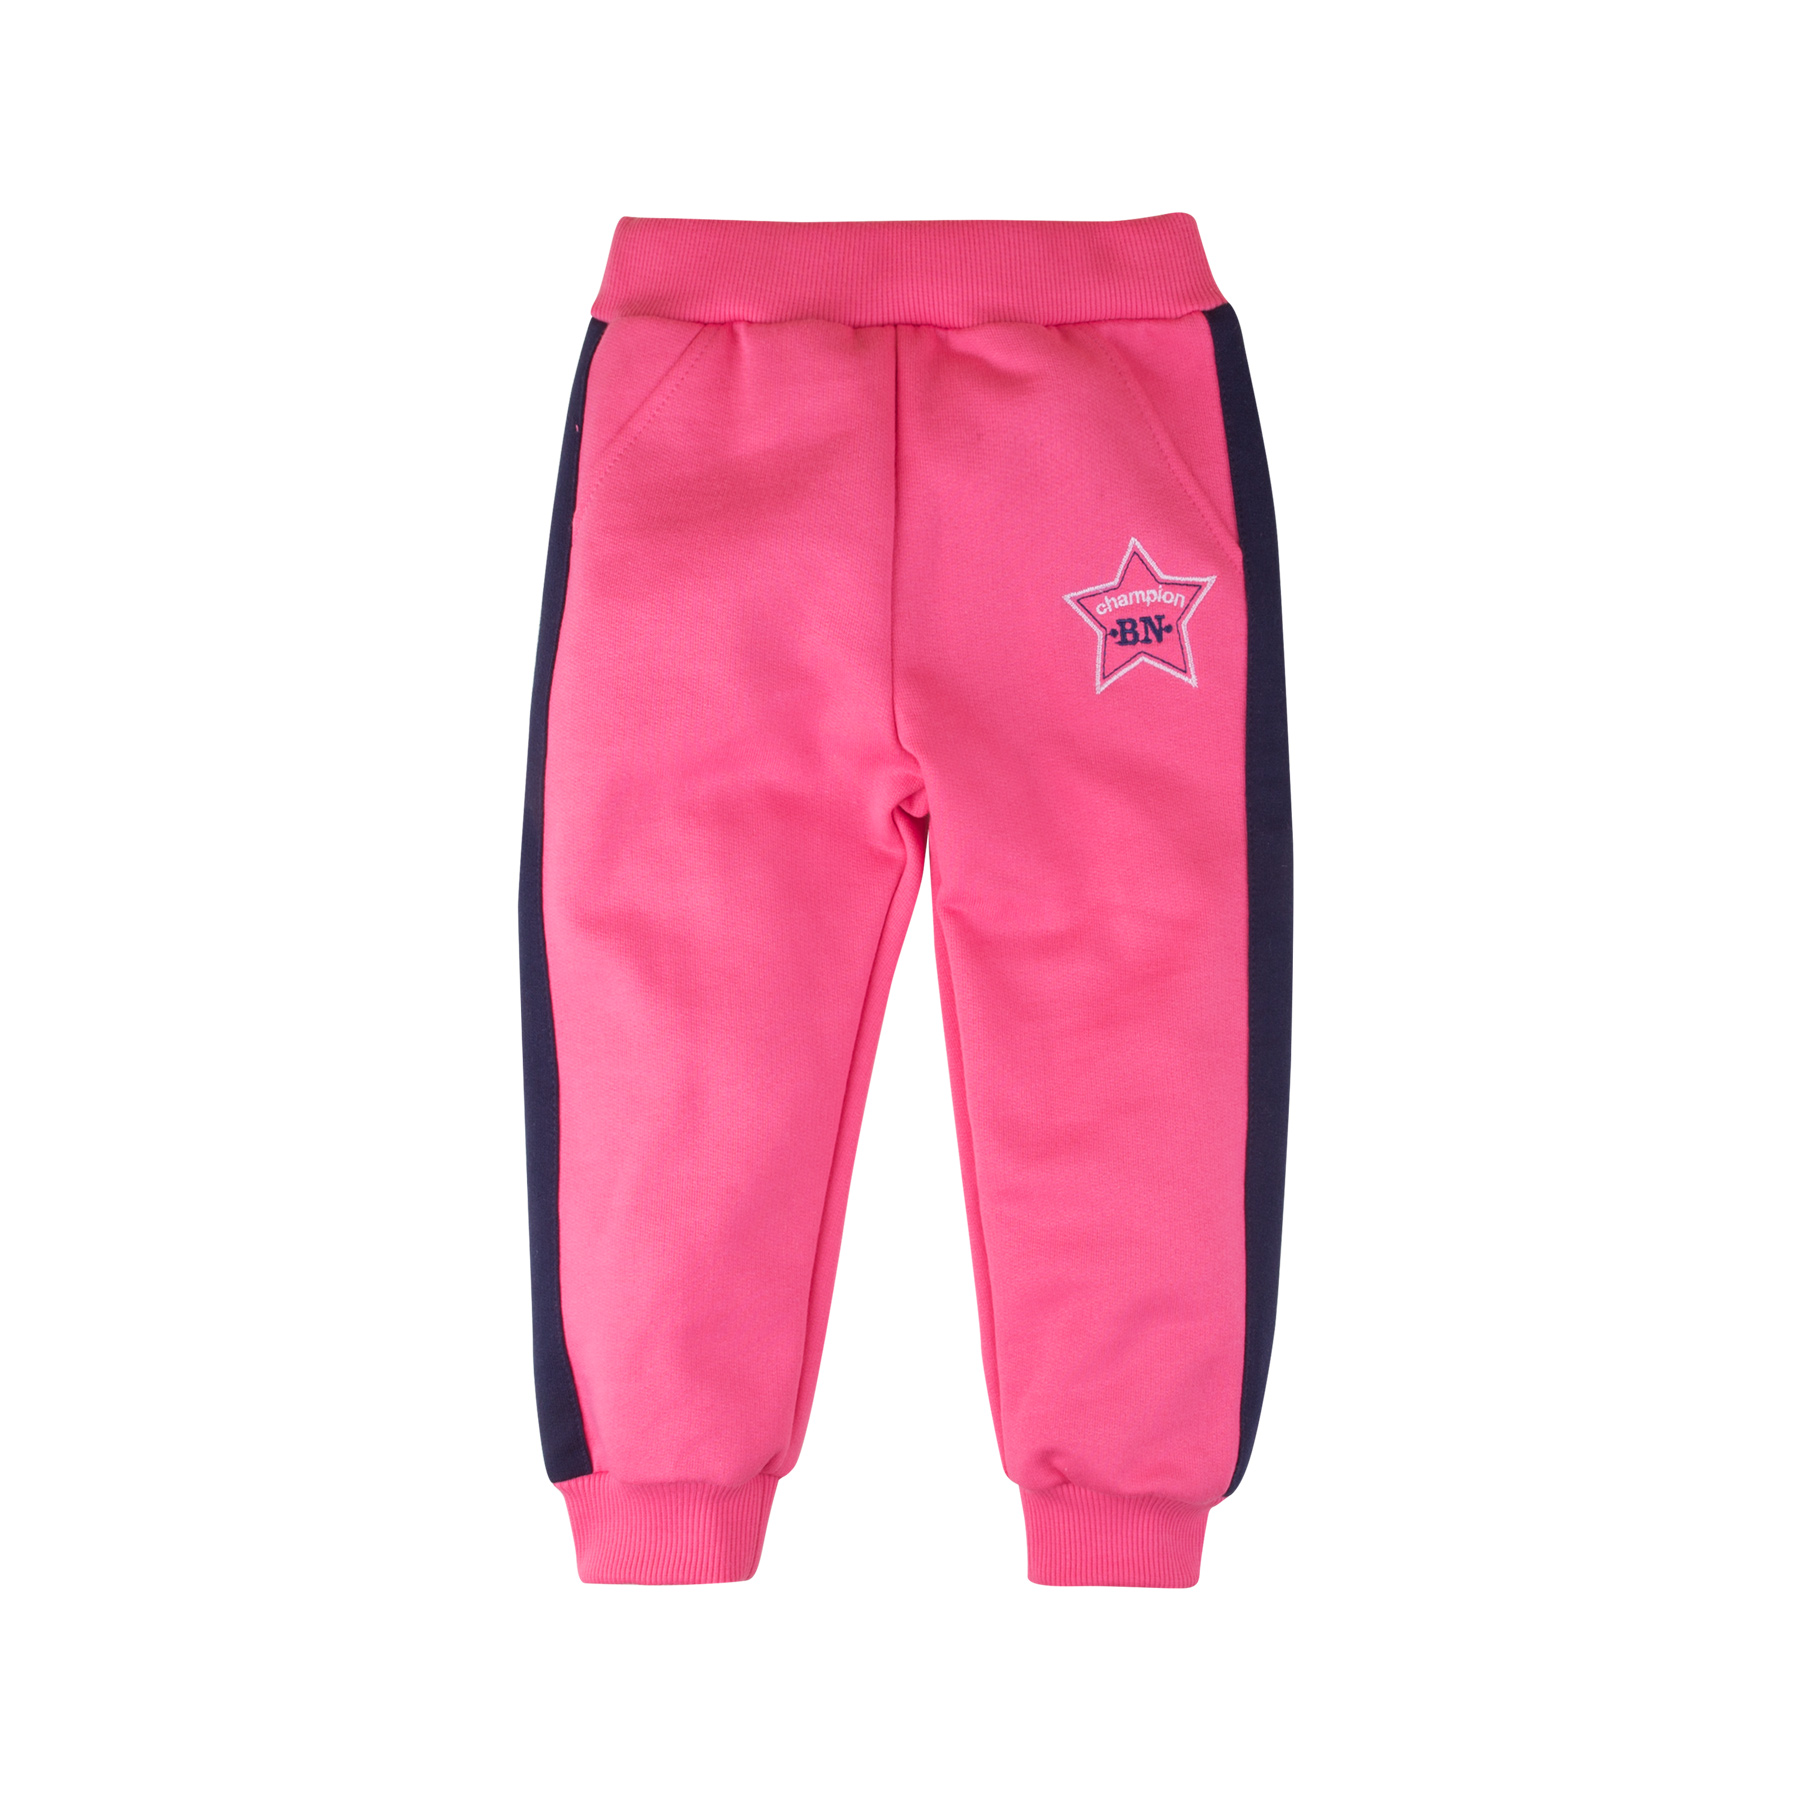 Pants for girls BOSSA NOVA 480B-462r kid clothes pants for girls bossa nova 487b 462b kid clothes